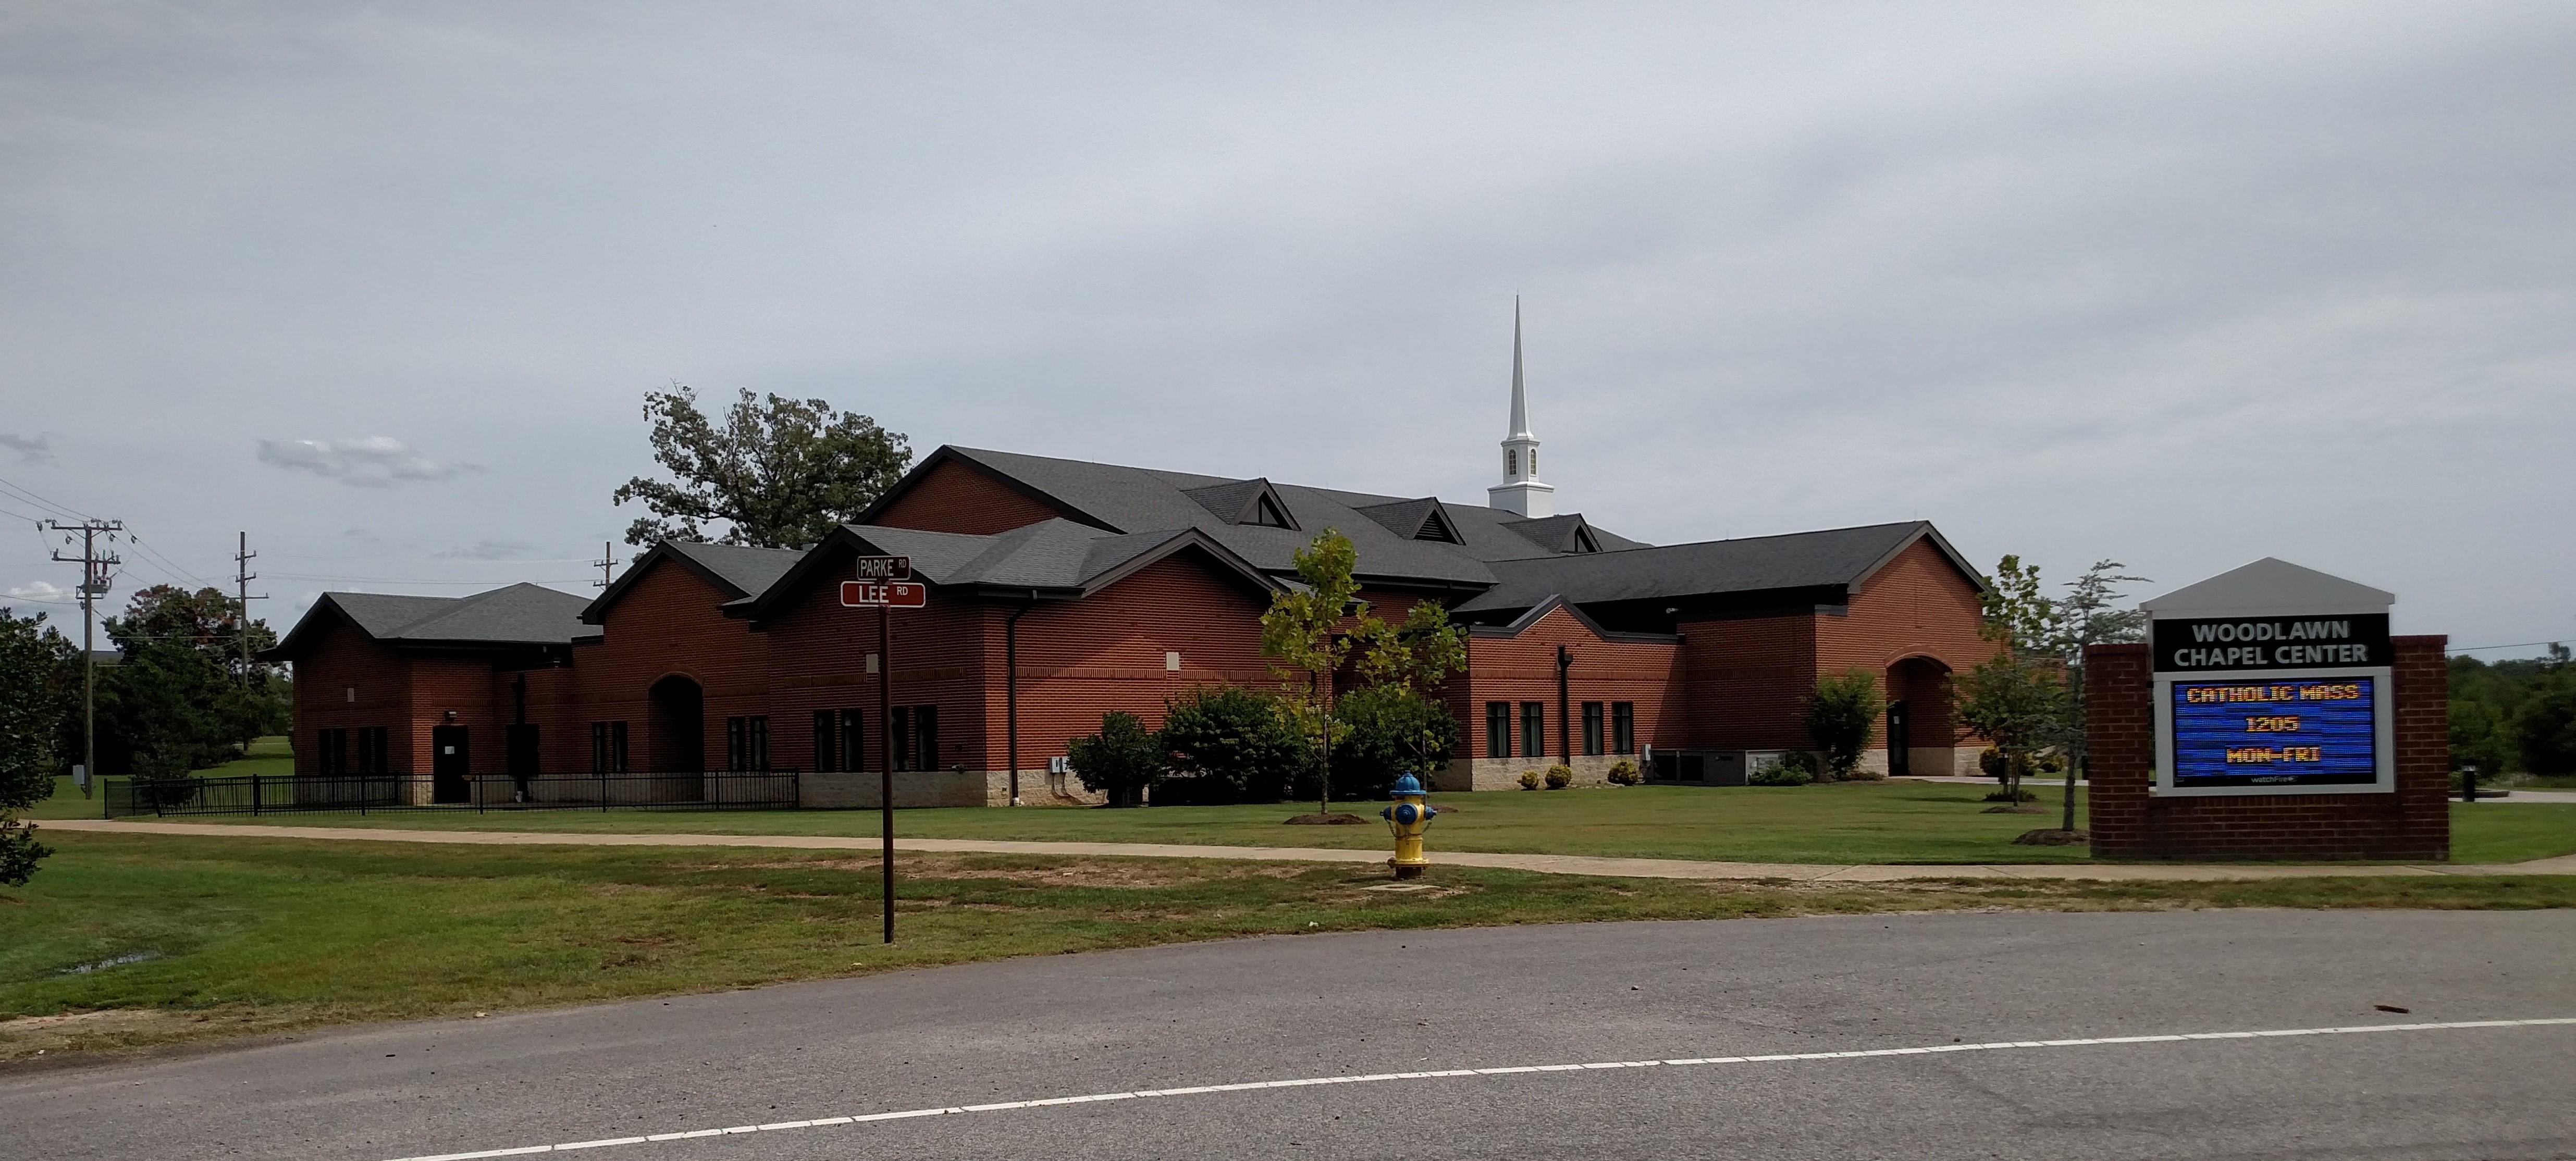 Woodlawn Chapel Center